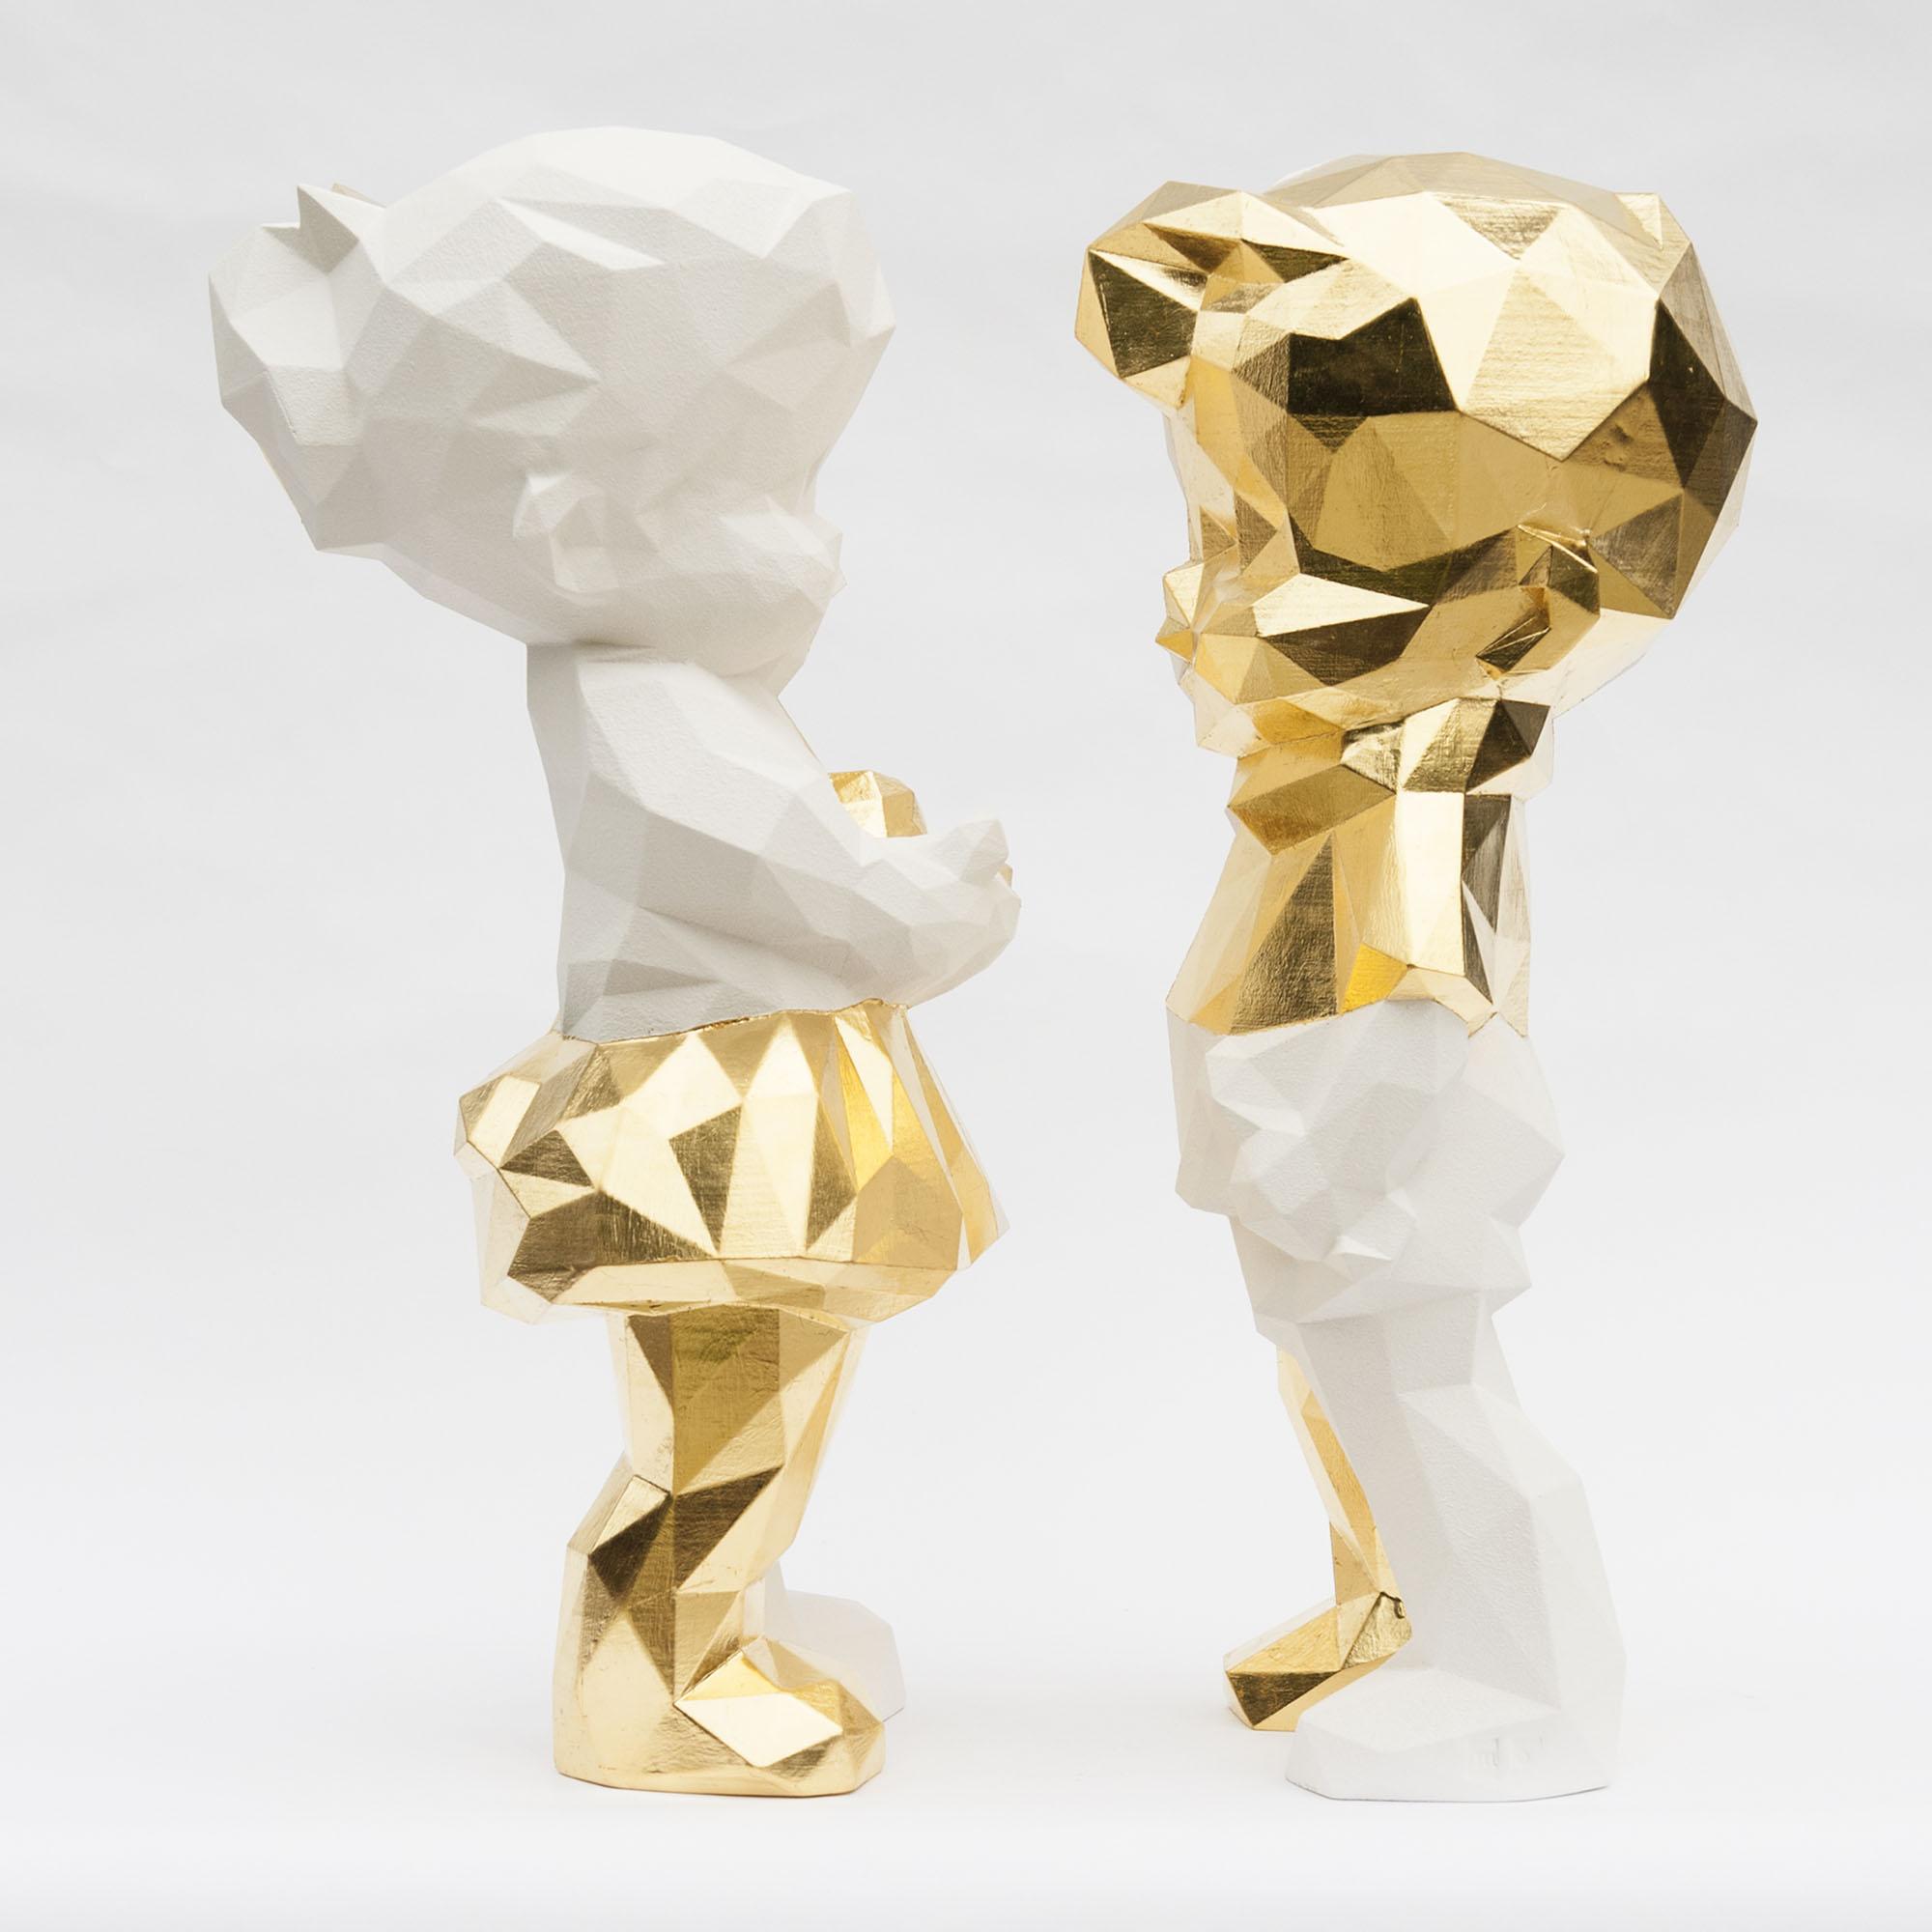 Mo Cornelisse - Lost Toys